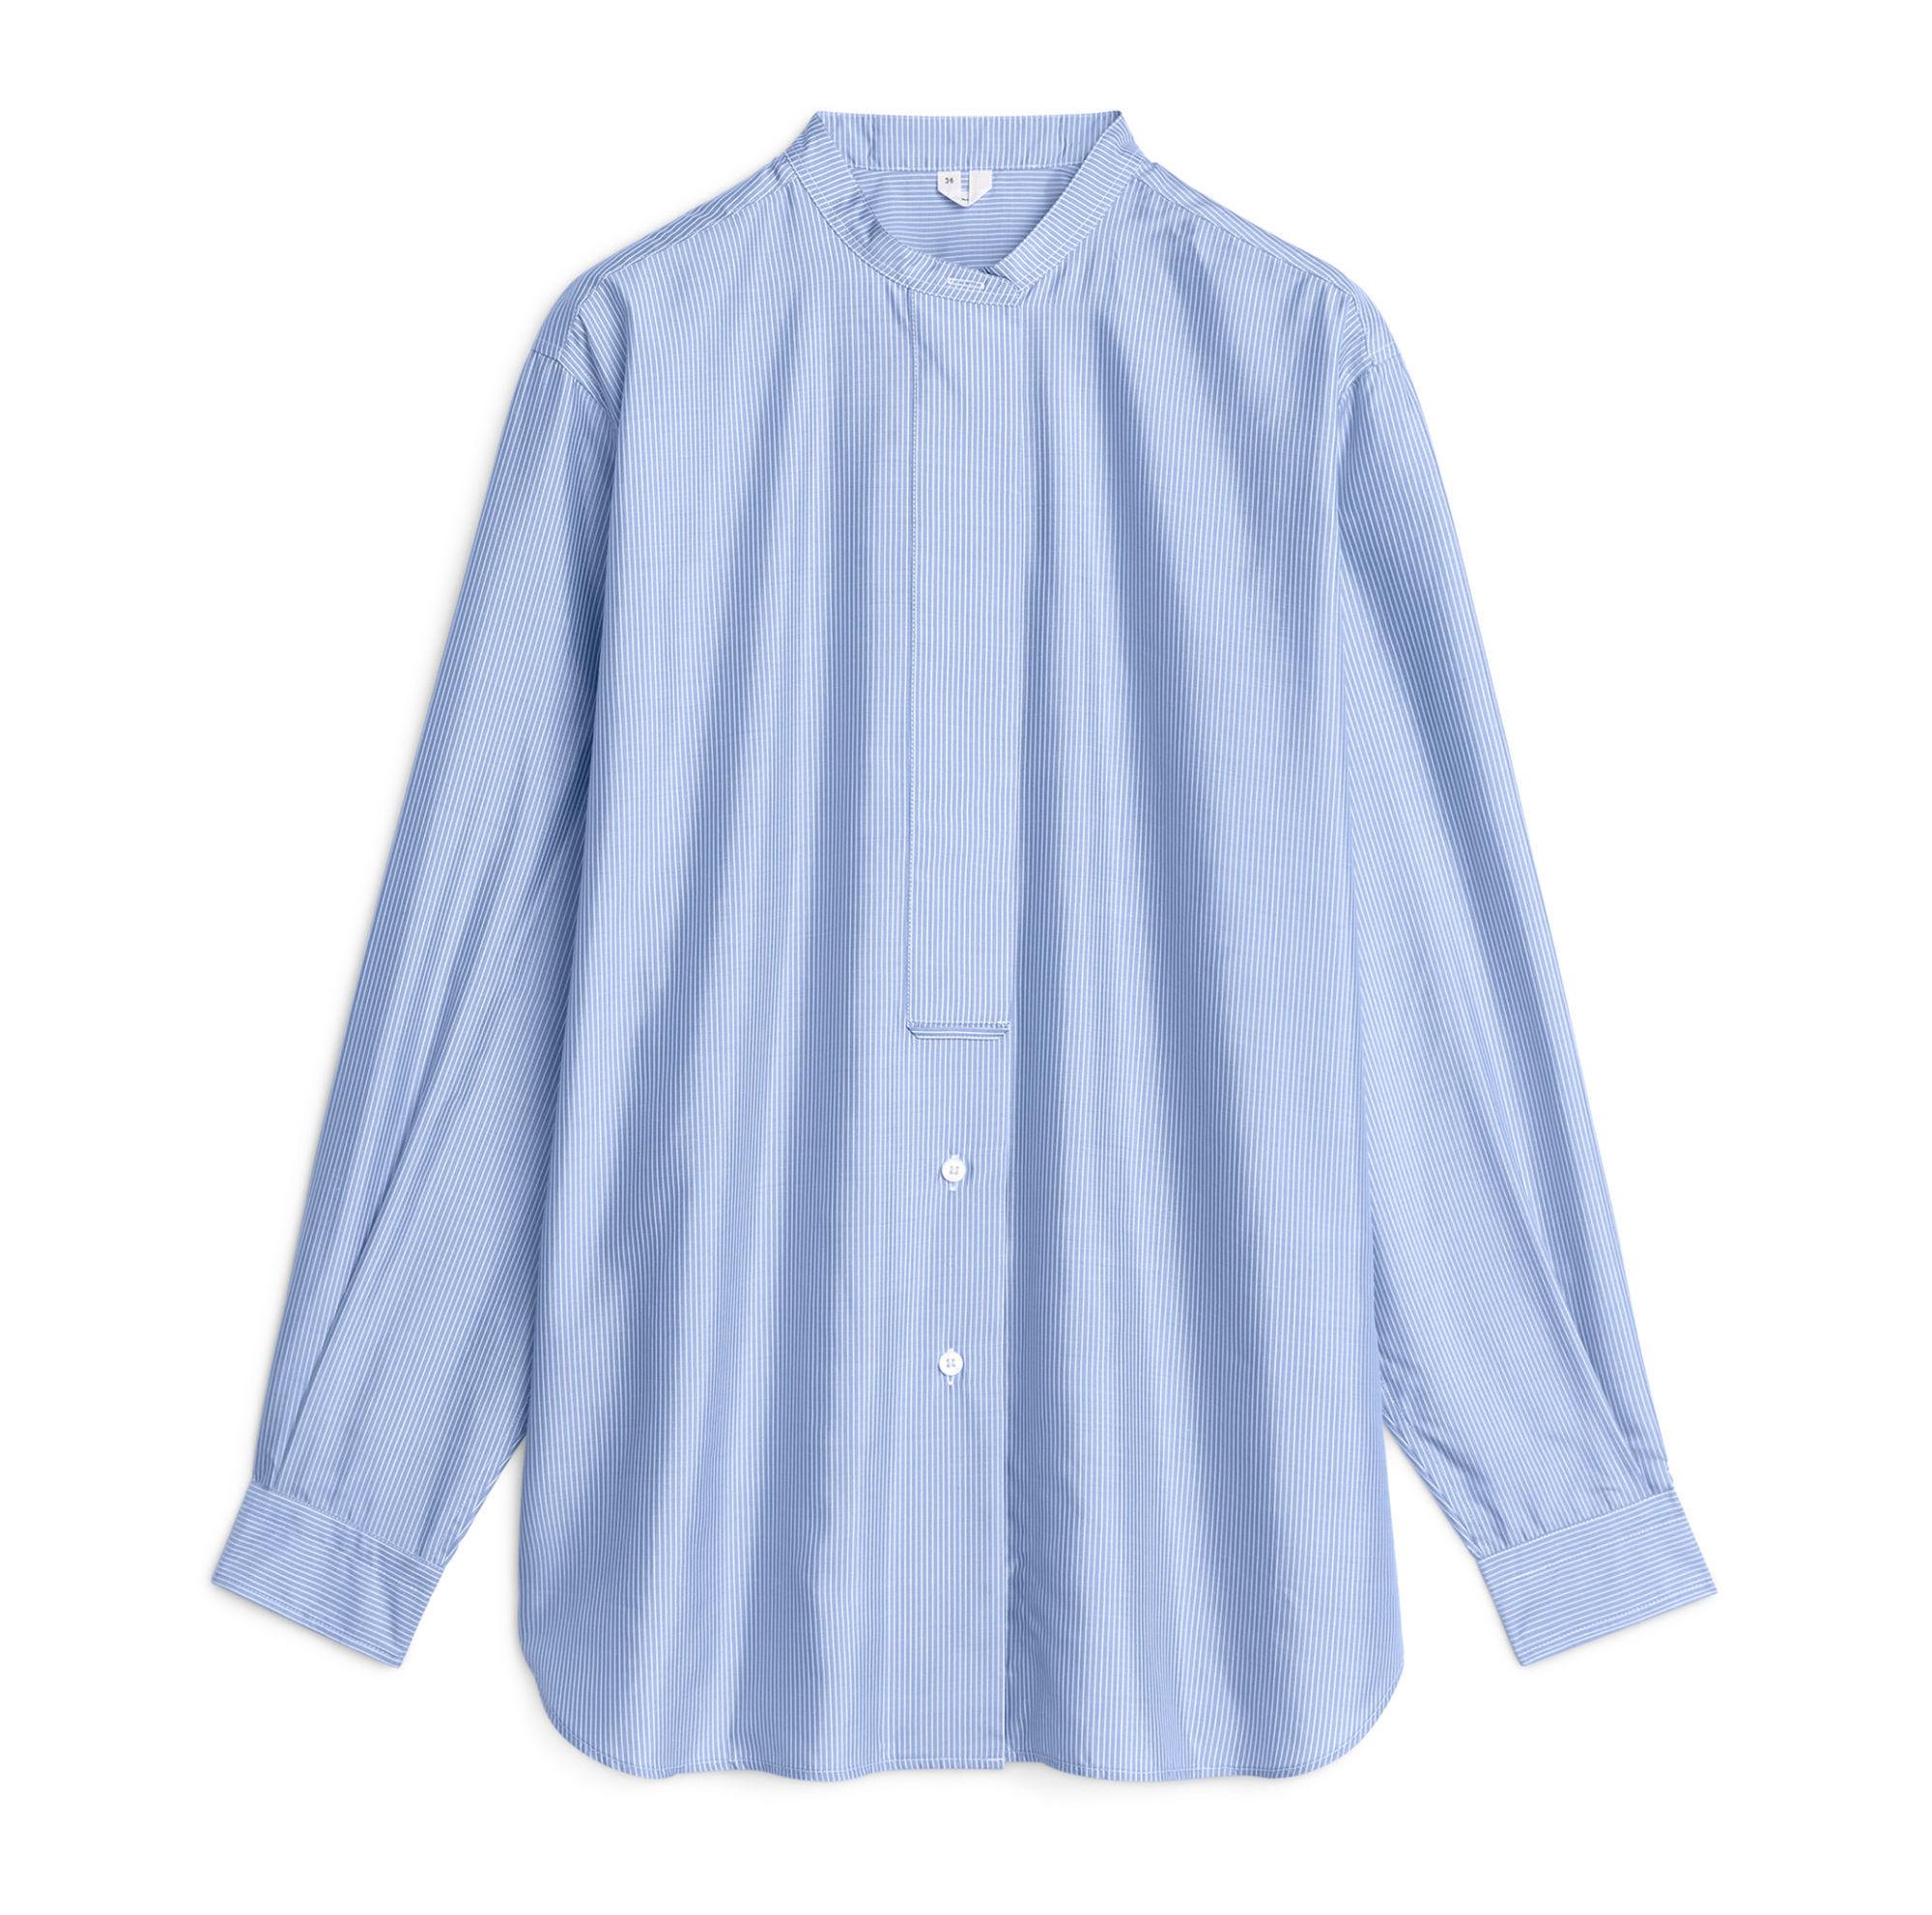 Oversize Silk Blouse  £99